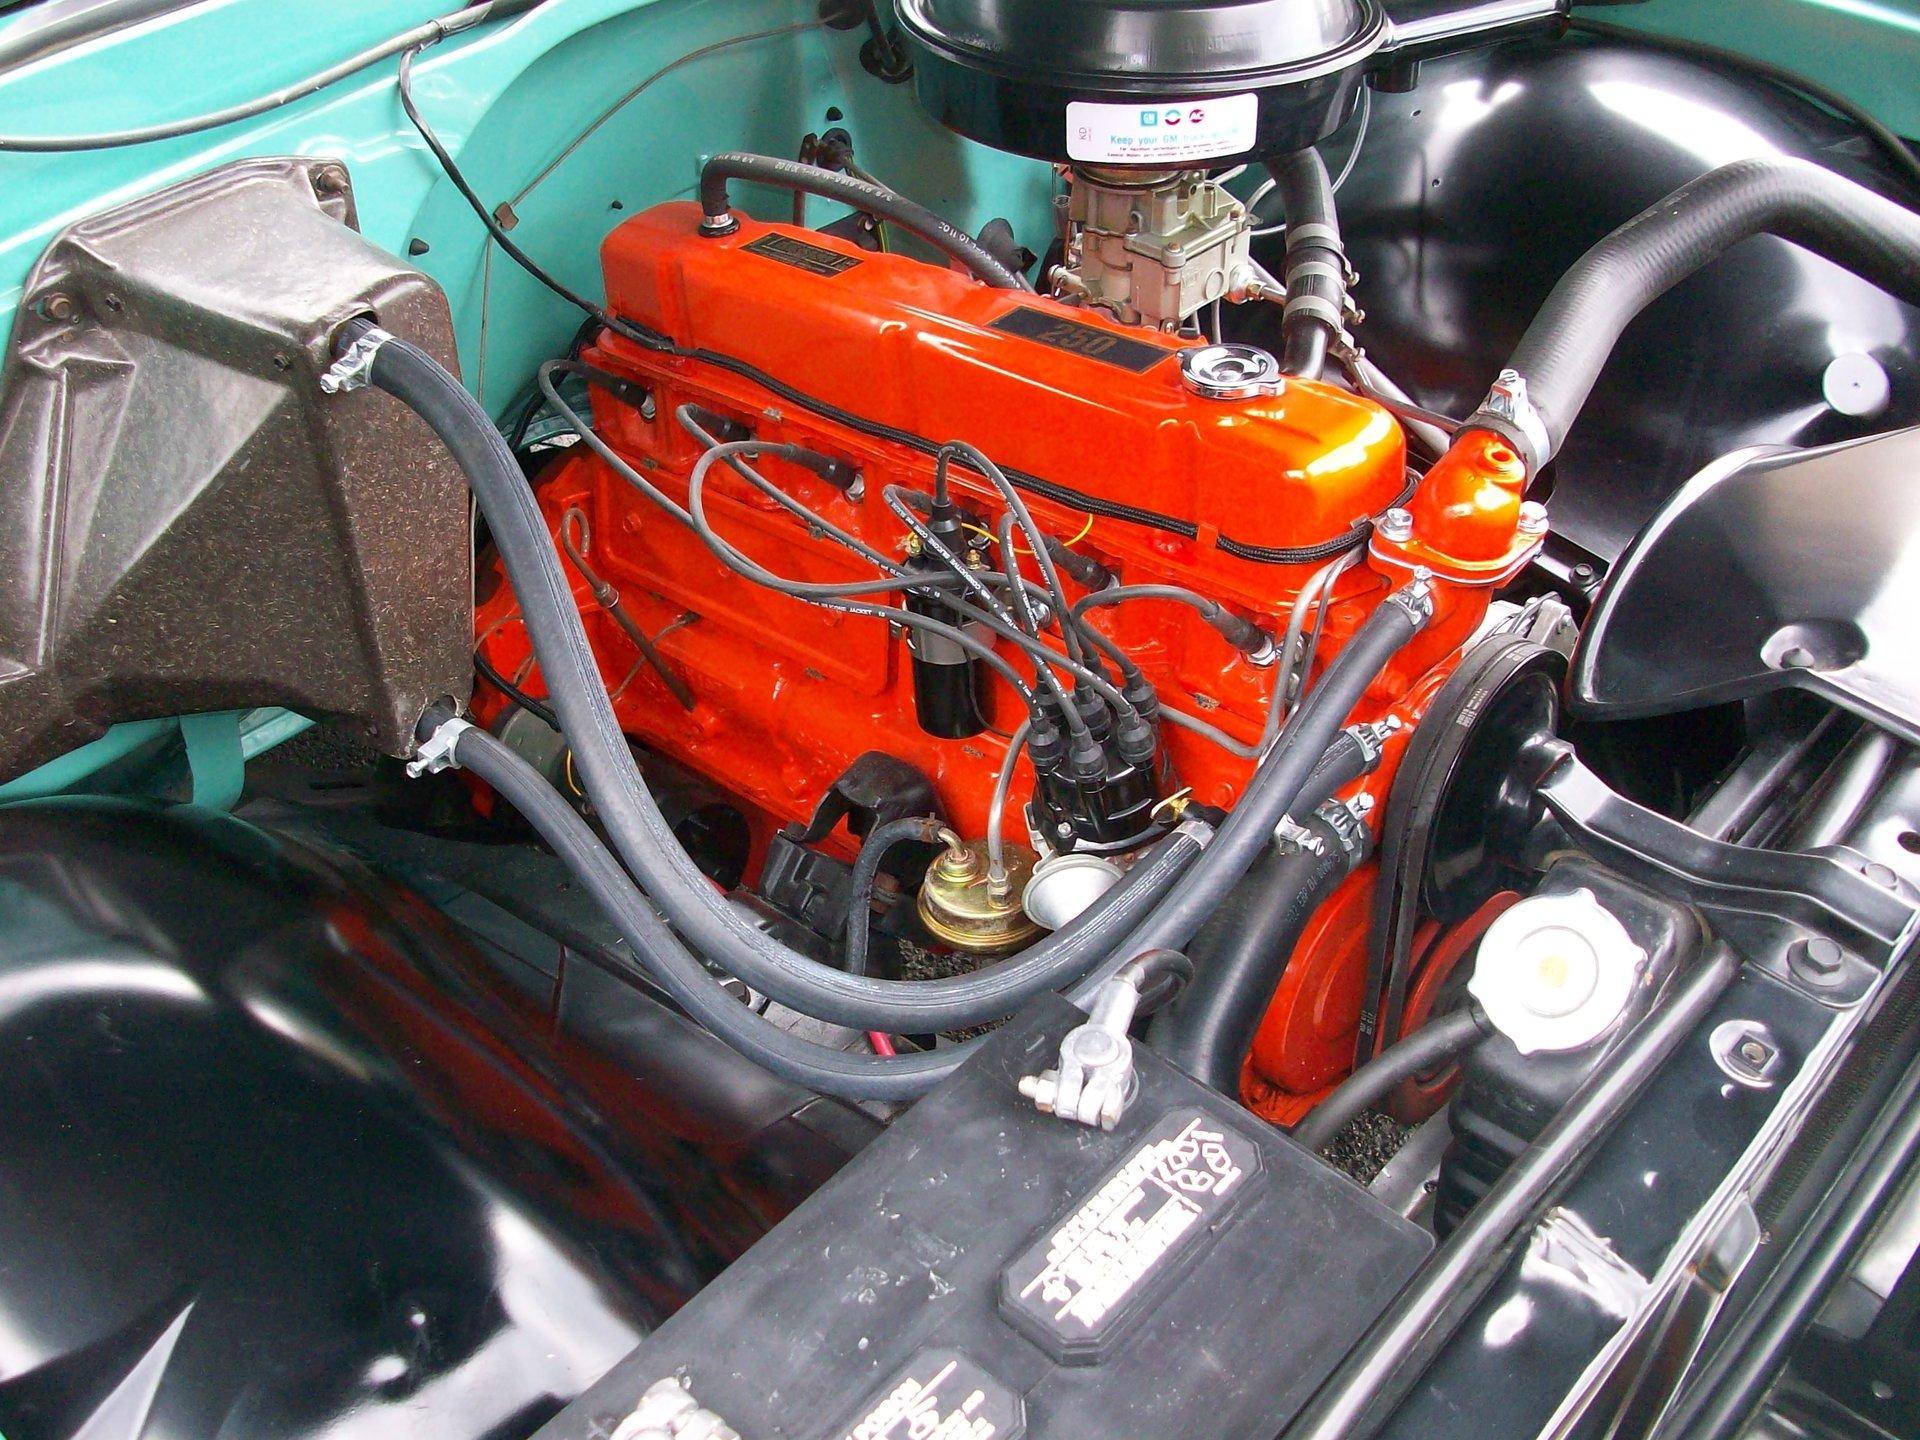 1968 Chevrolet C10 Stepside Pickup For Sale 105975 Mcg Chevy